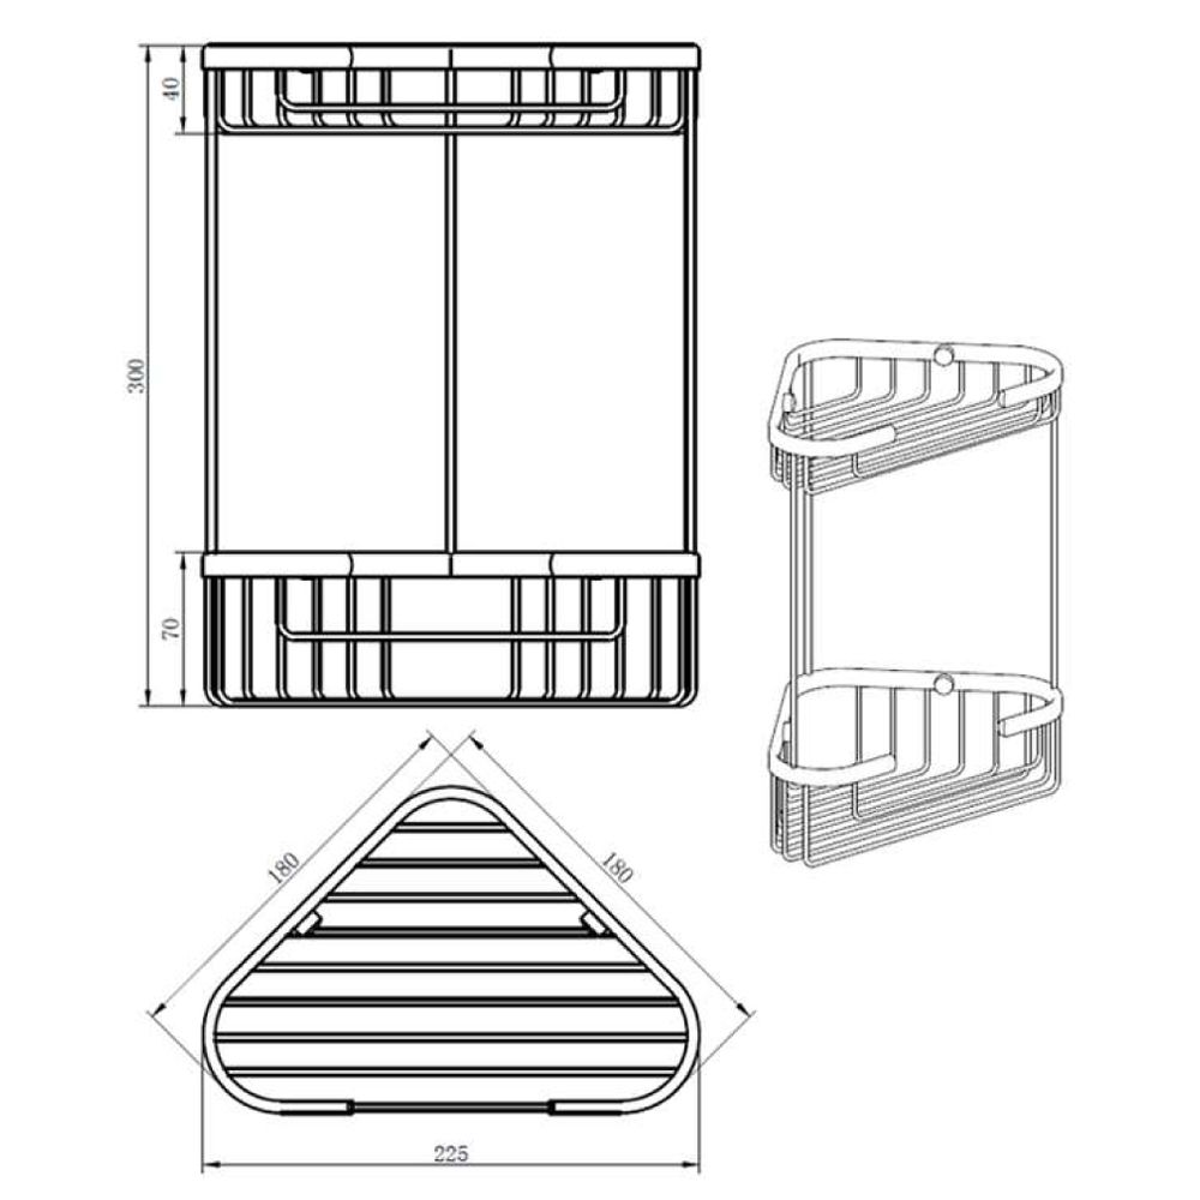 RAK Corner Double Soap Basket Measurements